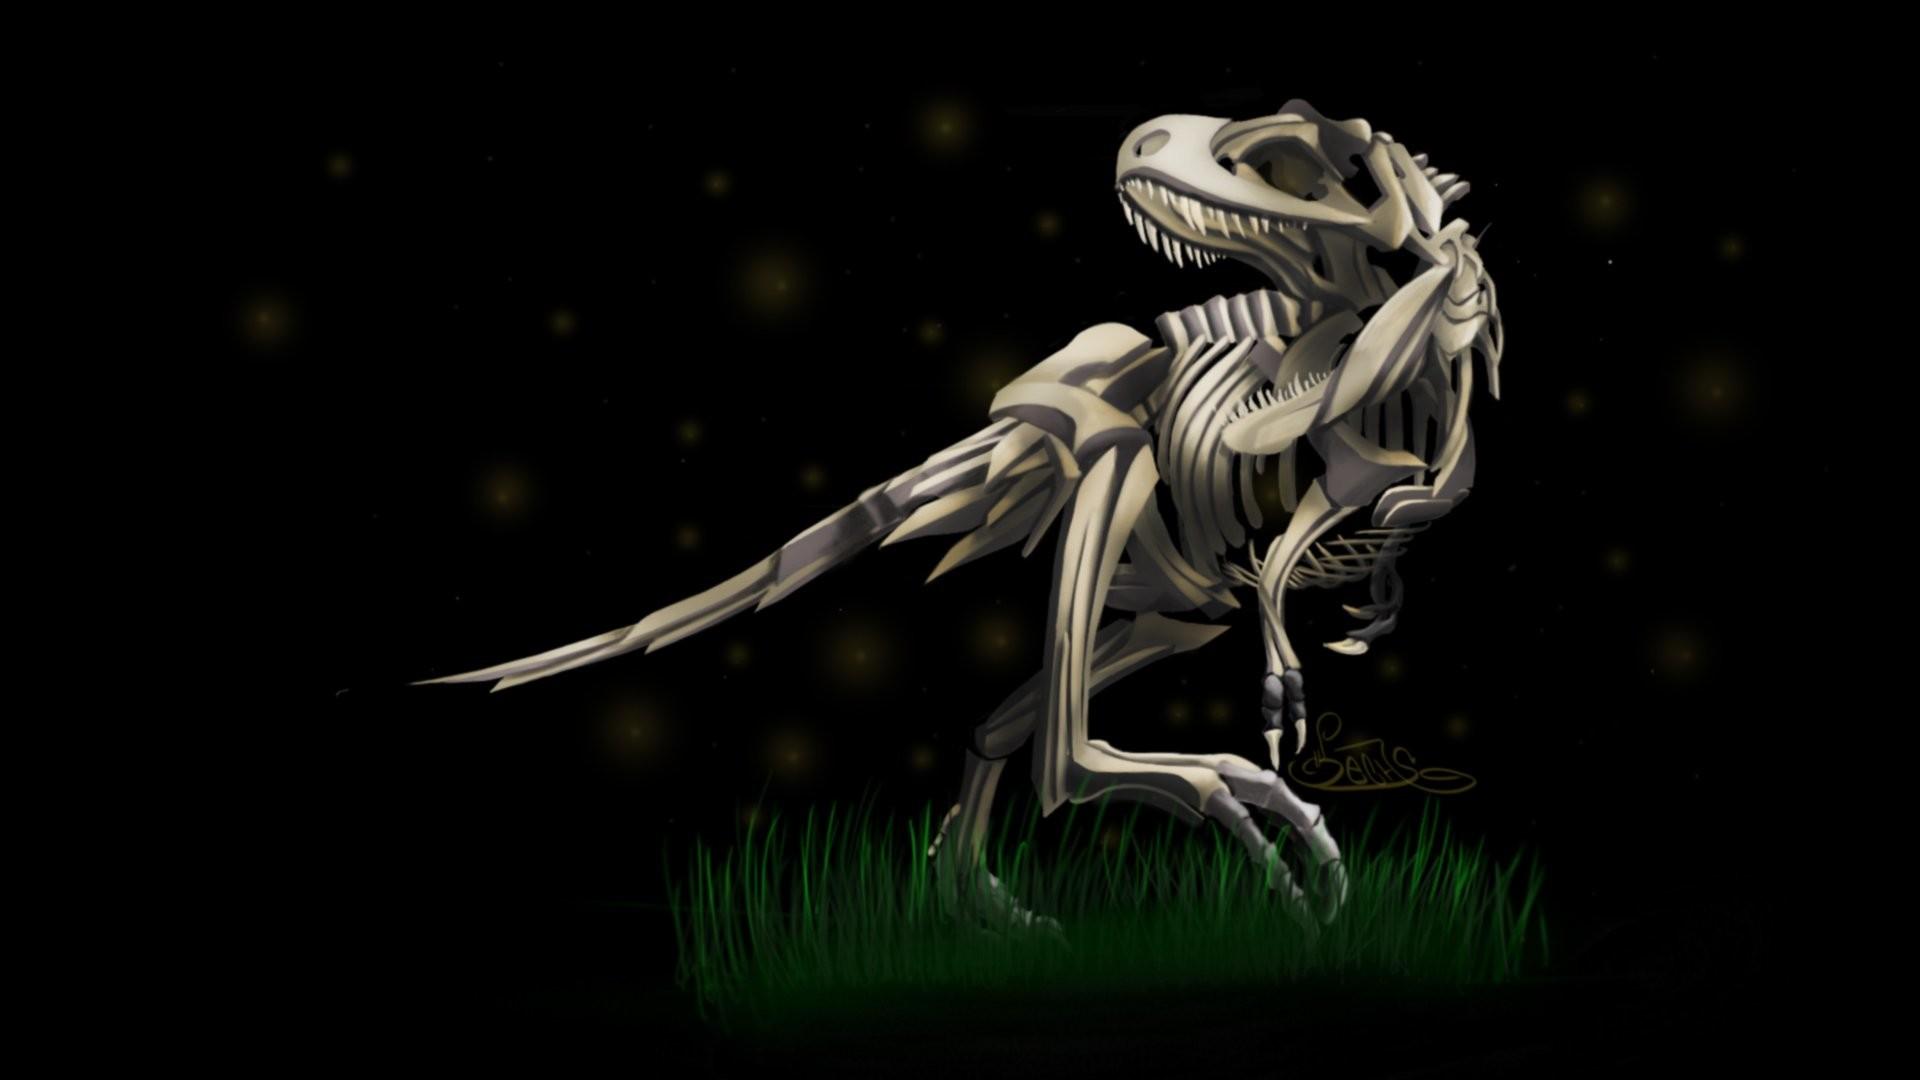 Res: 1920x1080, Dinosaurs skeletons Tyrannosaurus Rex wallpaper |  | 309492 |  WallpaperUP